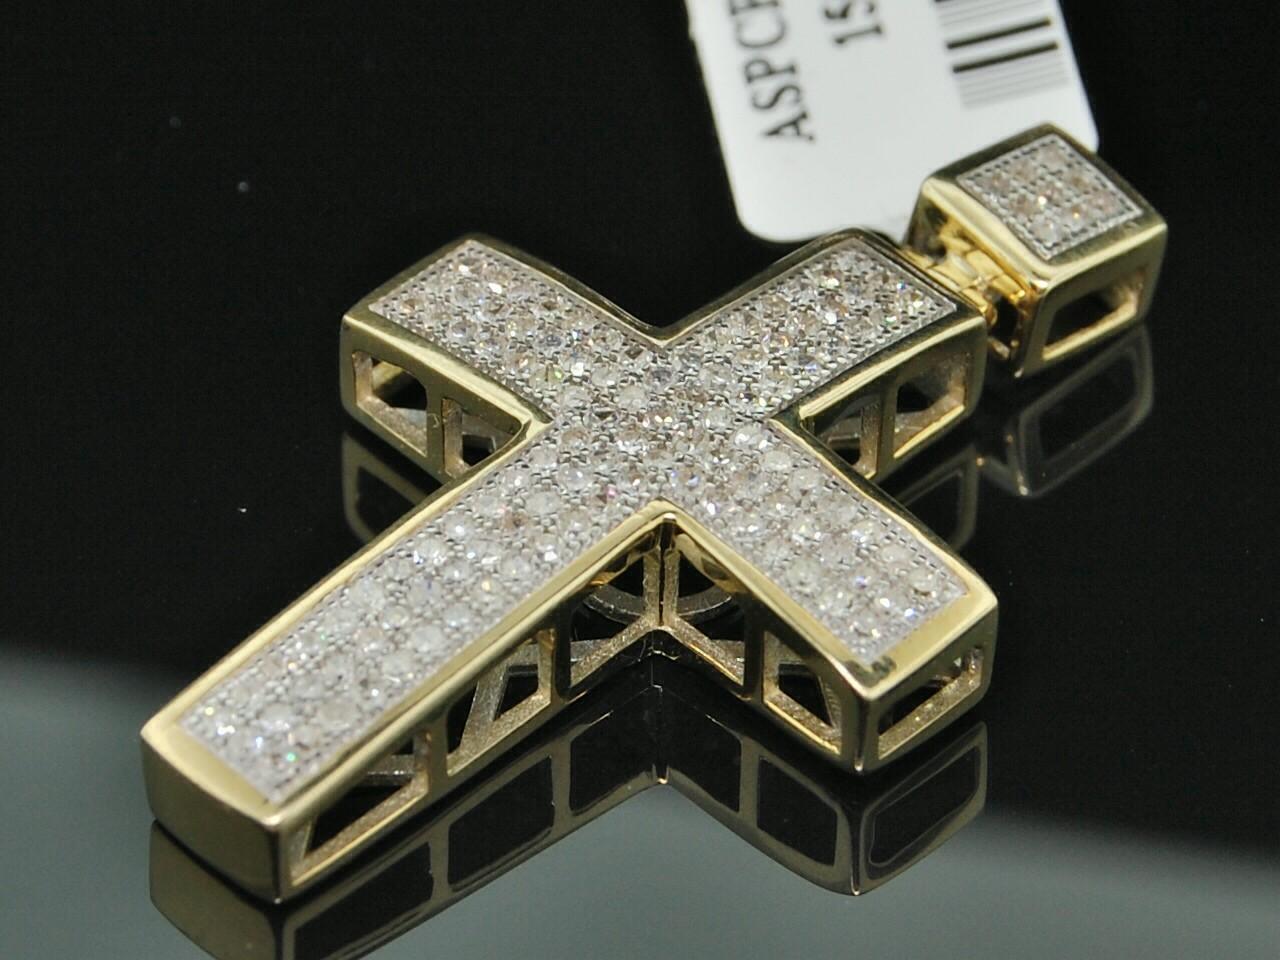 MEN LADIES YELLOW GOLD DIAMOND MINI CROSS CHARM PENDANT